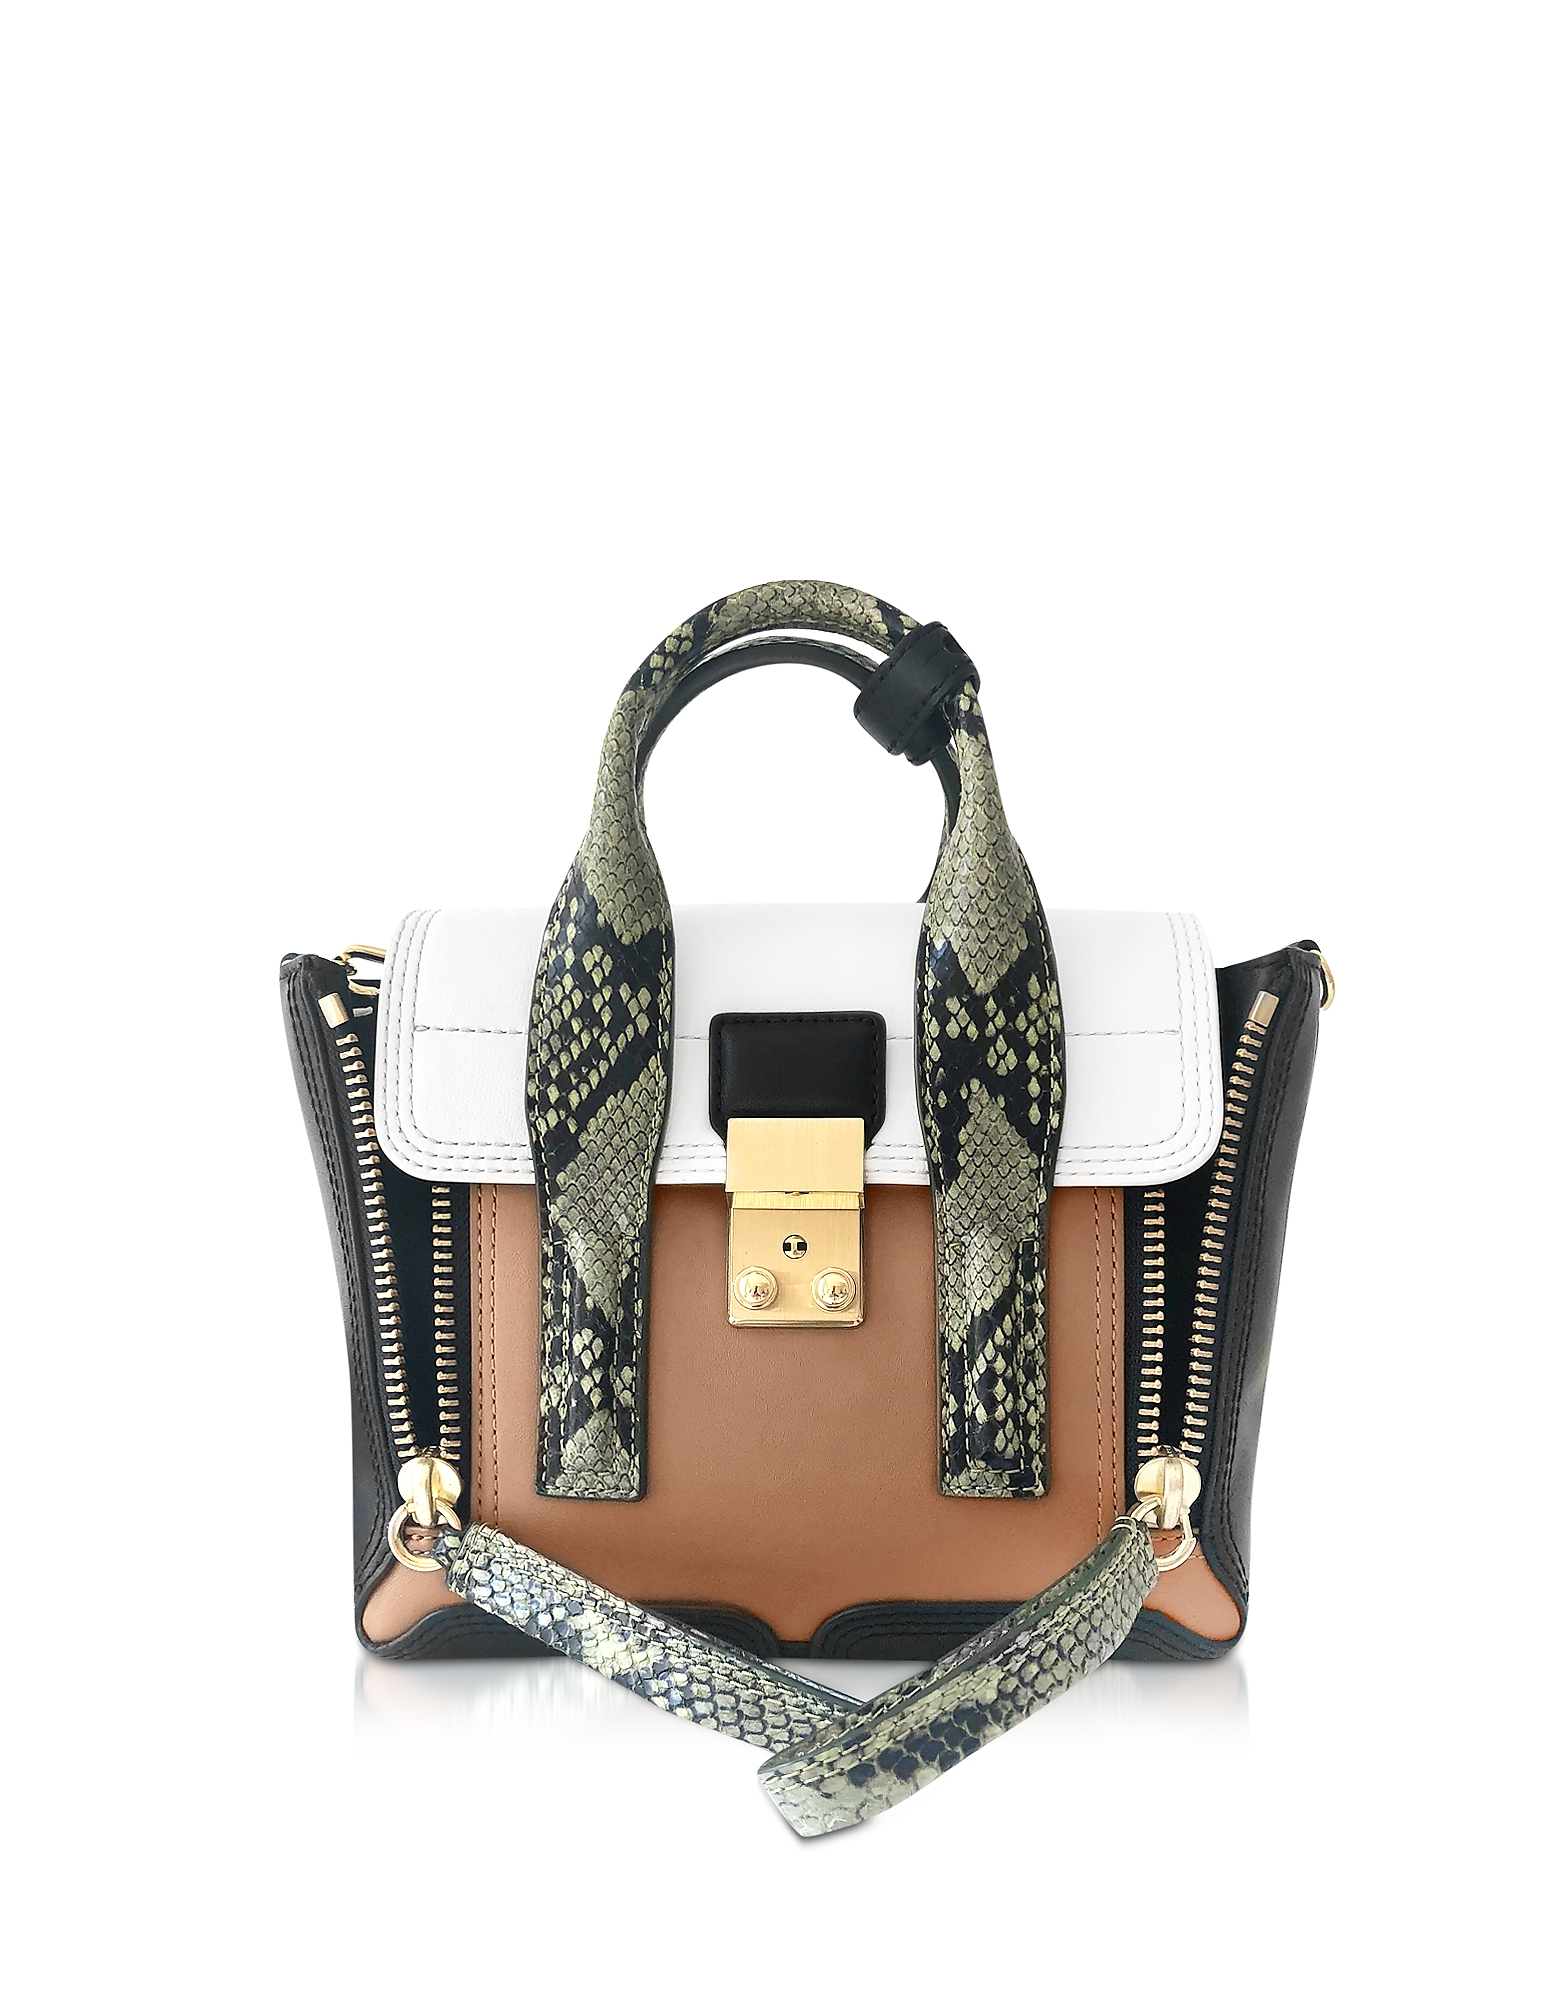 3.1 Phillip Lim  Handbags Pashli Mini Satchel Bag